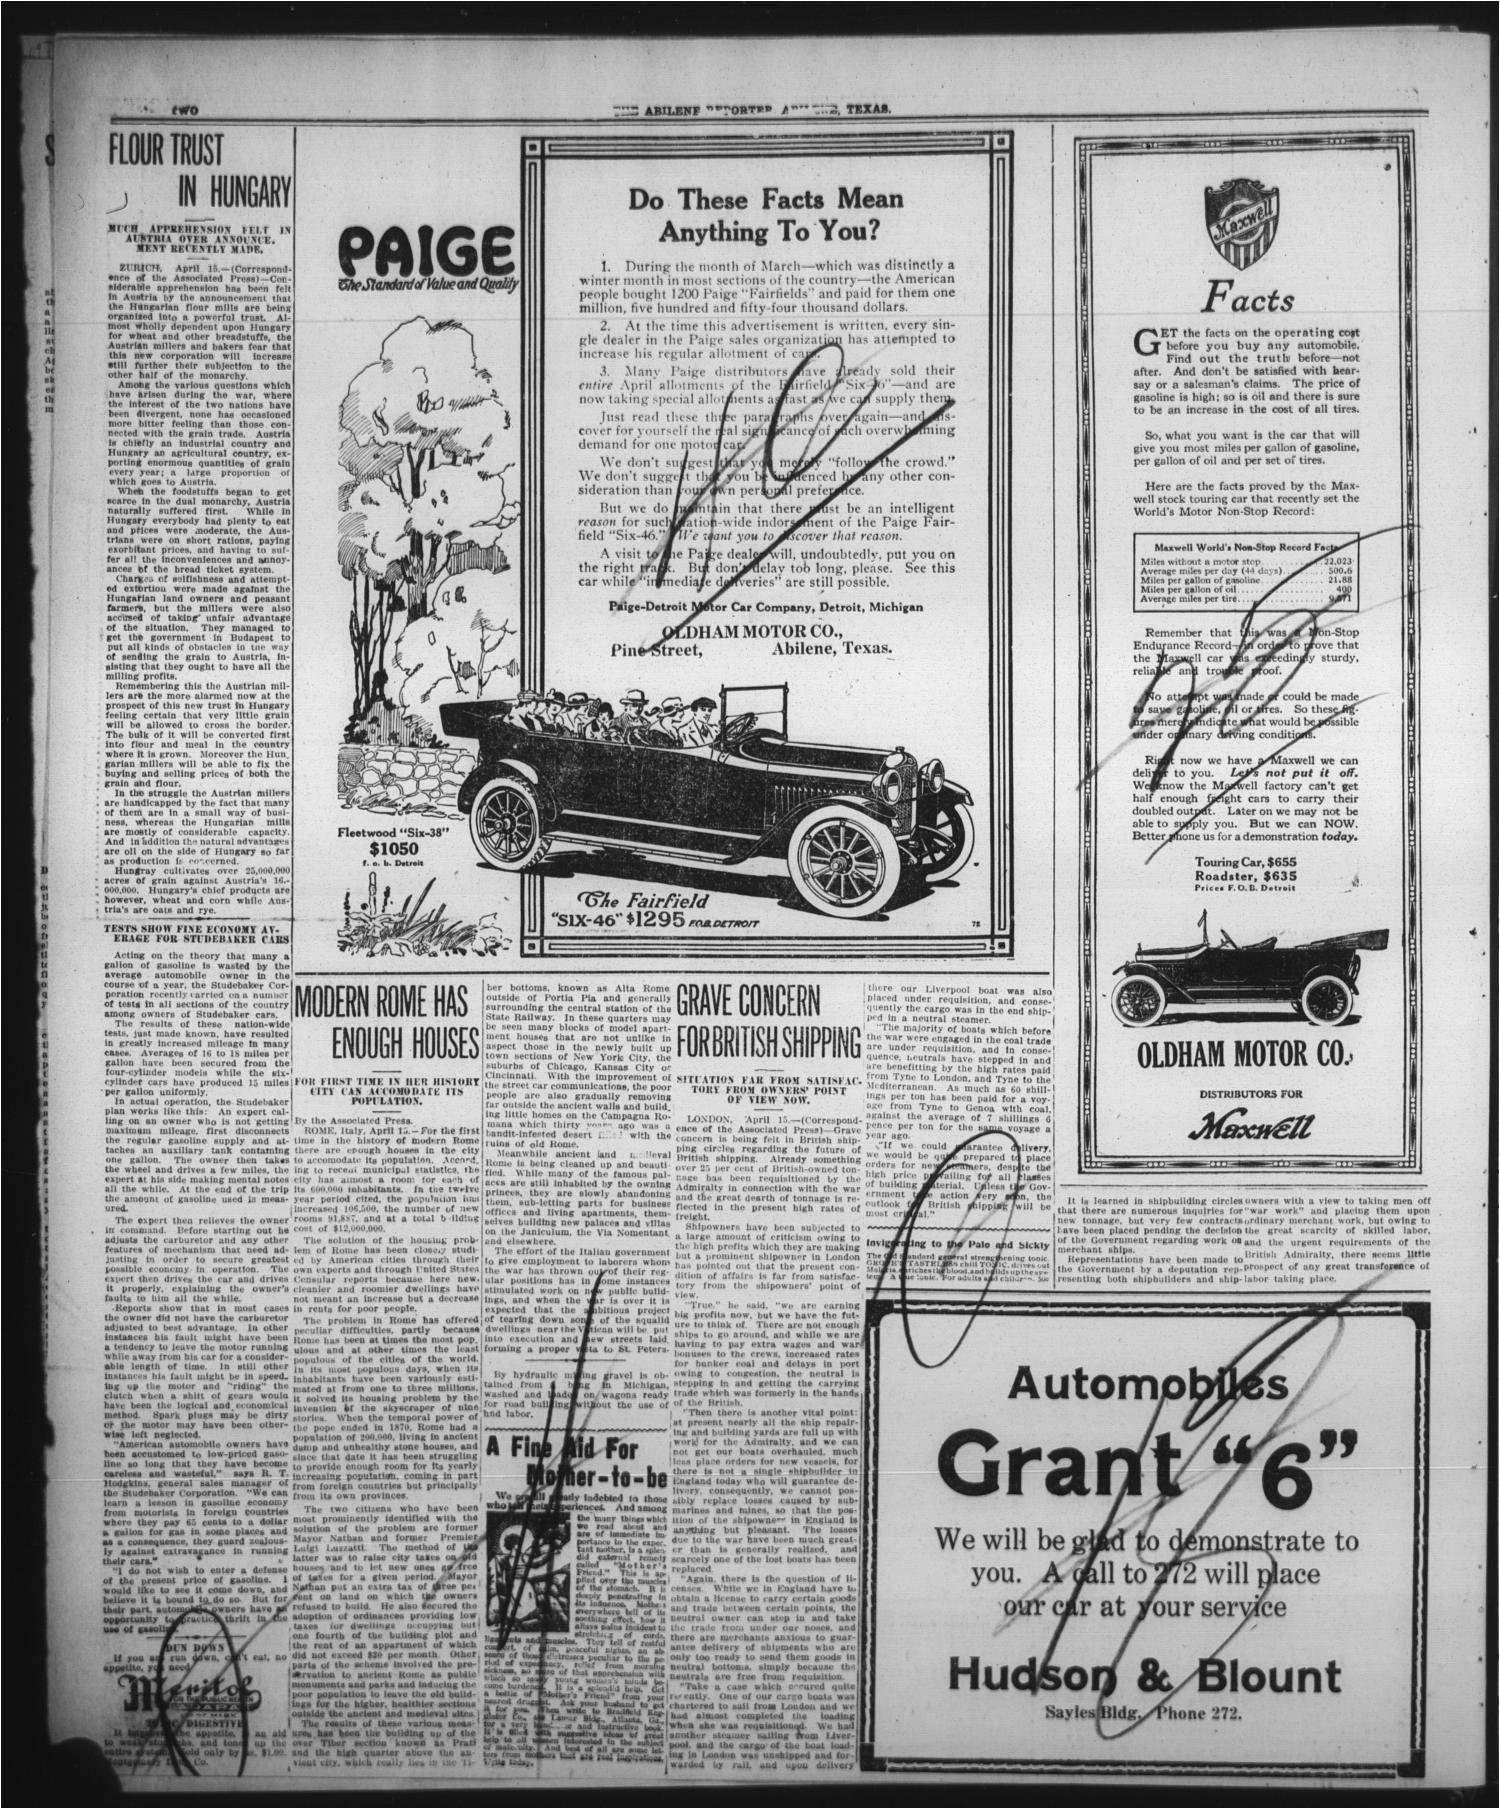 the abilene daily reporter abilene tex vol 20 no 28 ed 1 sunday april 16 1916 page 14 of 18 the portal to texas history